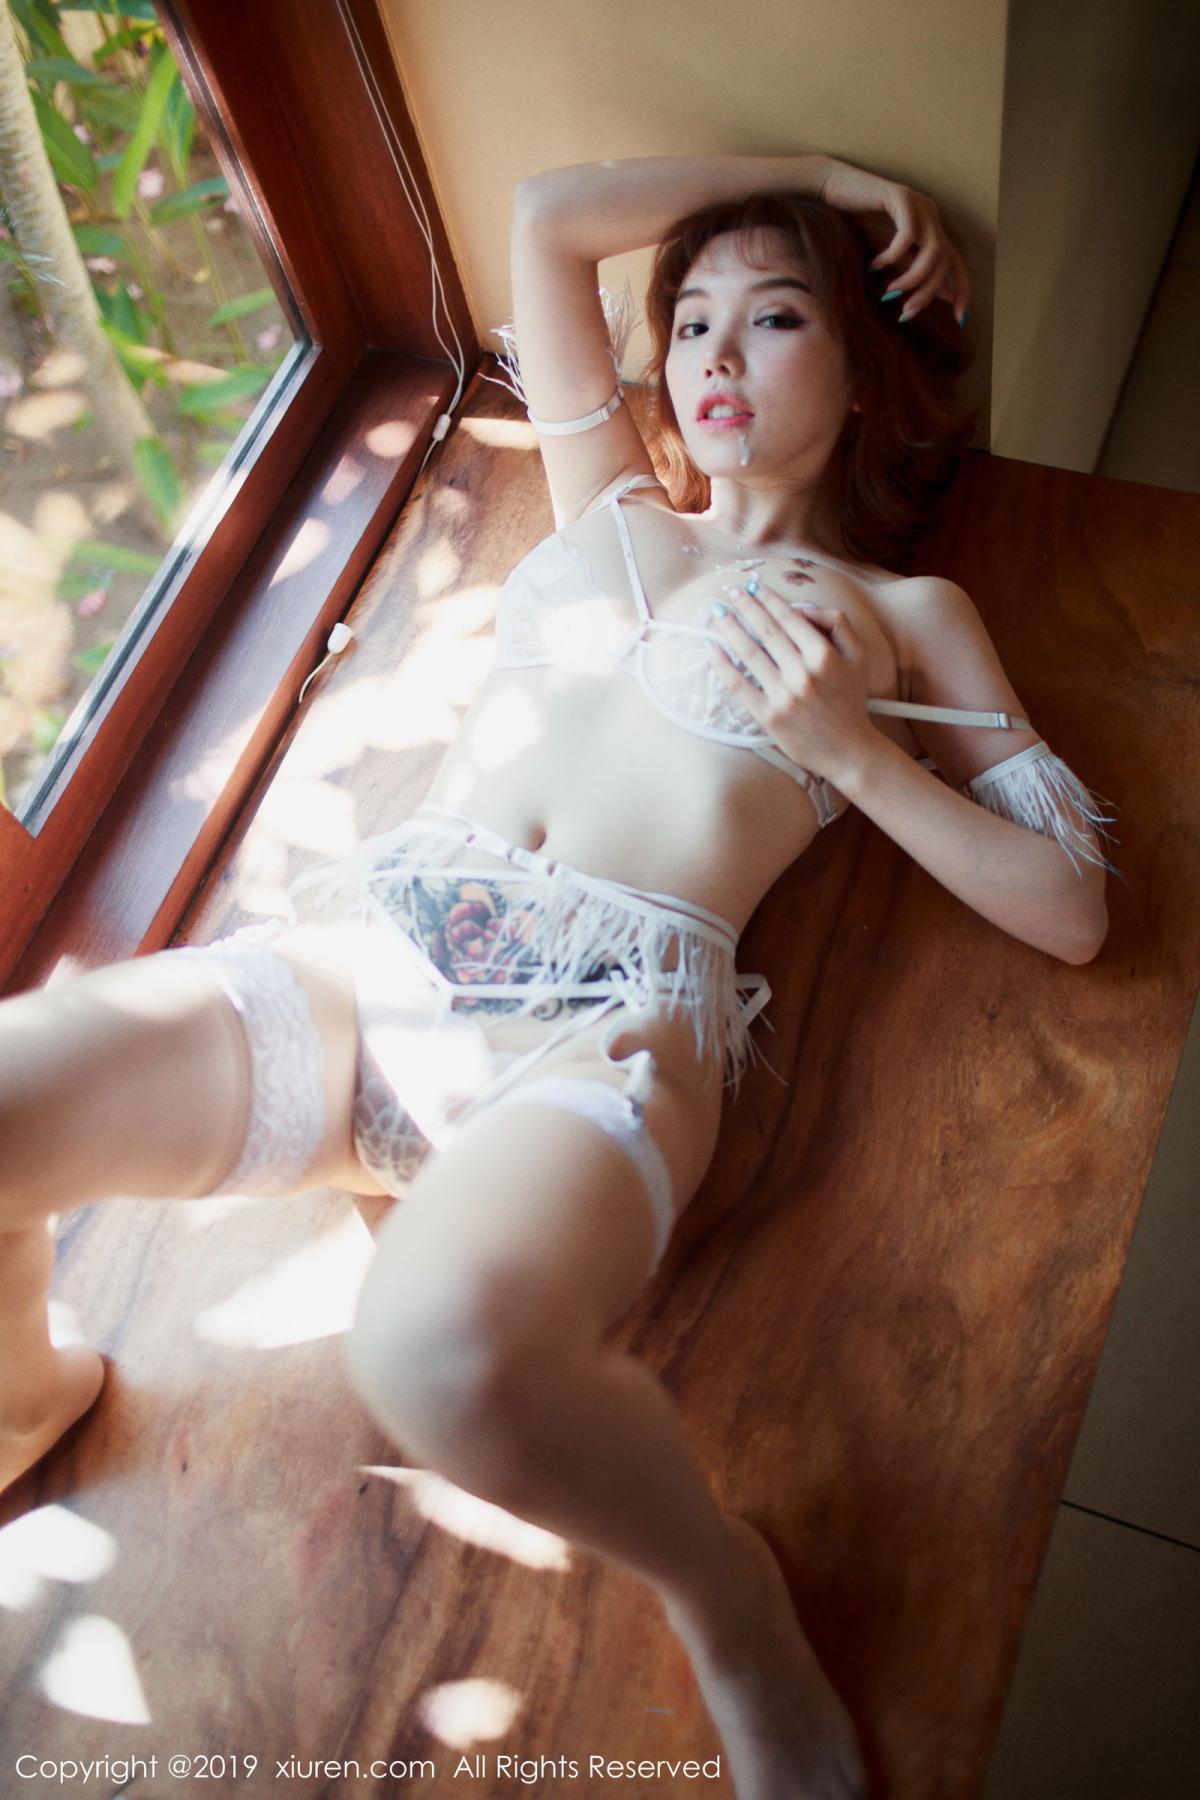 [XiuRen] Vol.1562 Huang Le Ran 48P, Huang Le Ran, Underwear, Xiuren